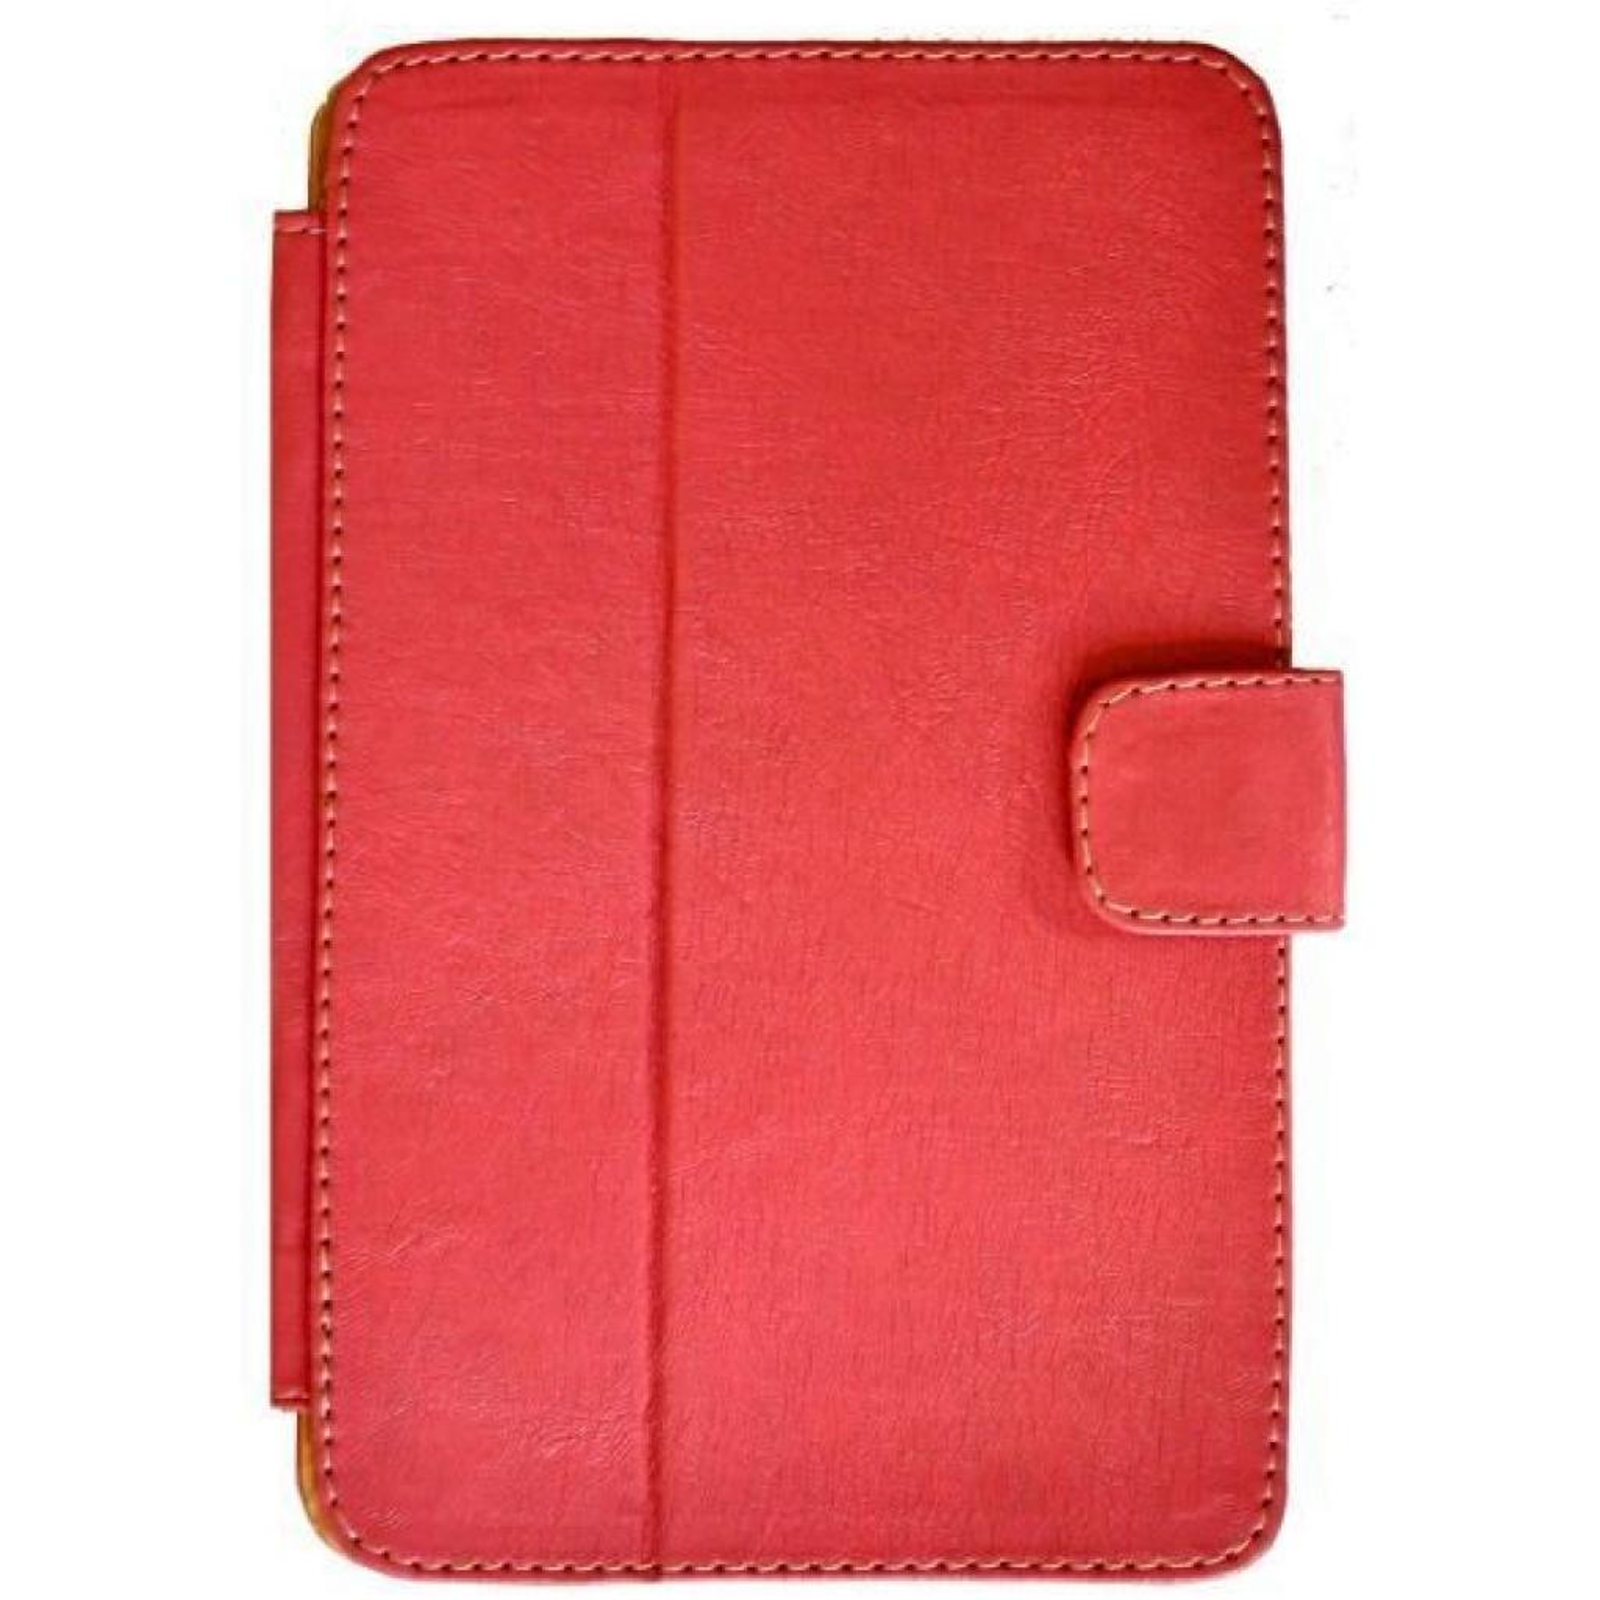 Чехол для планшета Vento 8 COOL - red